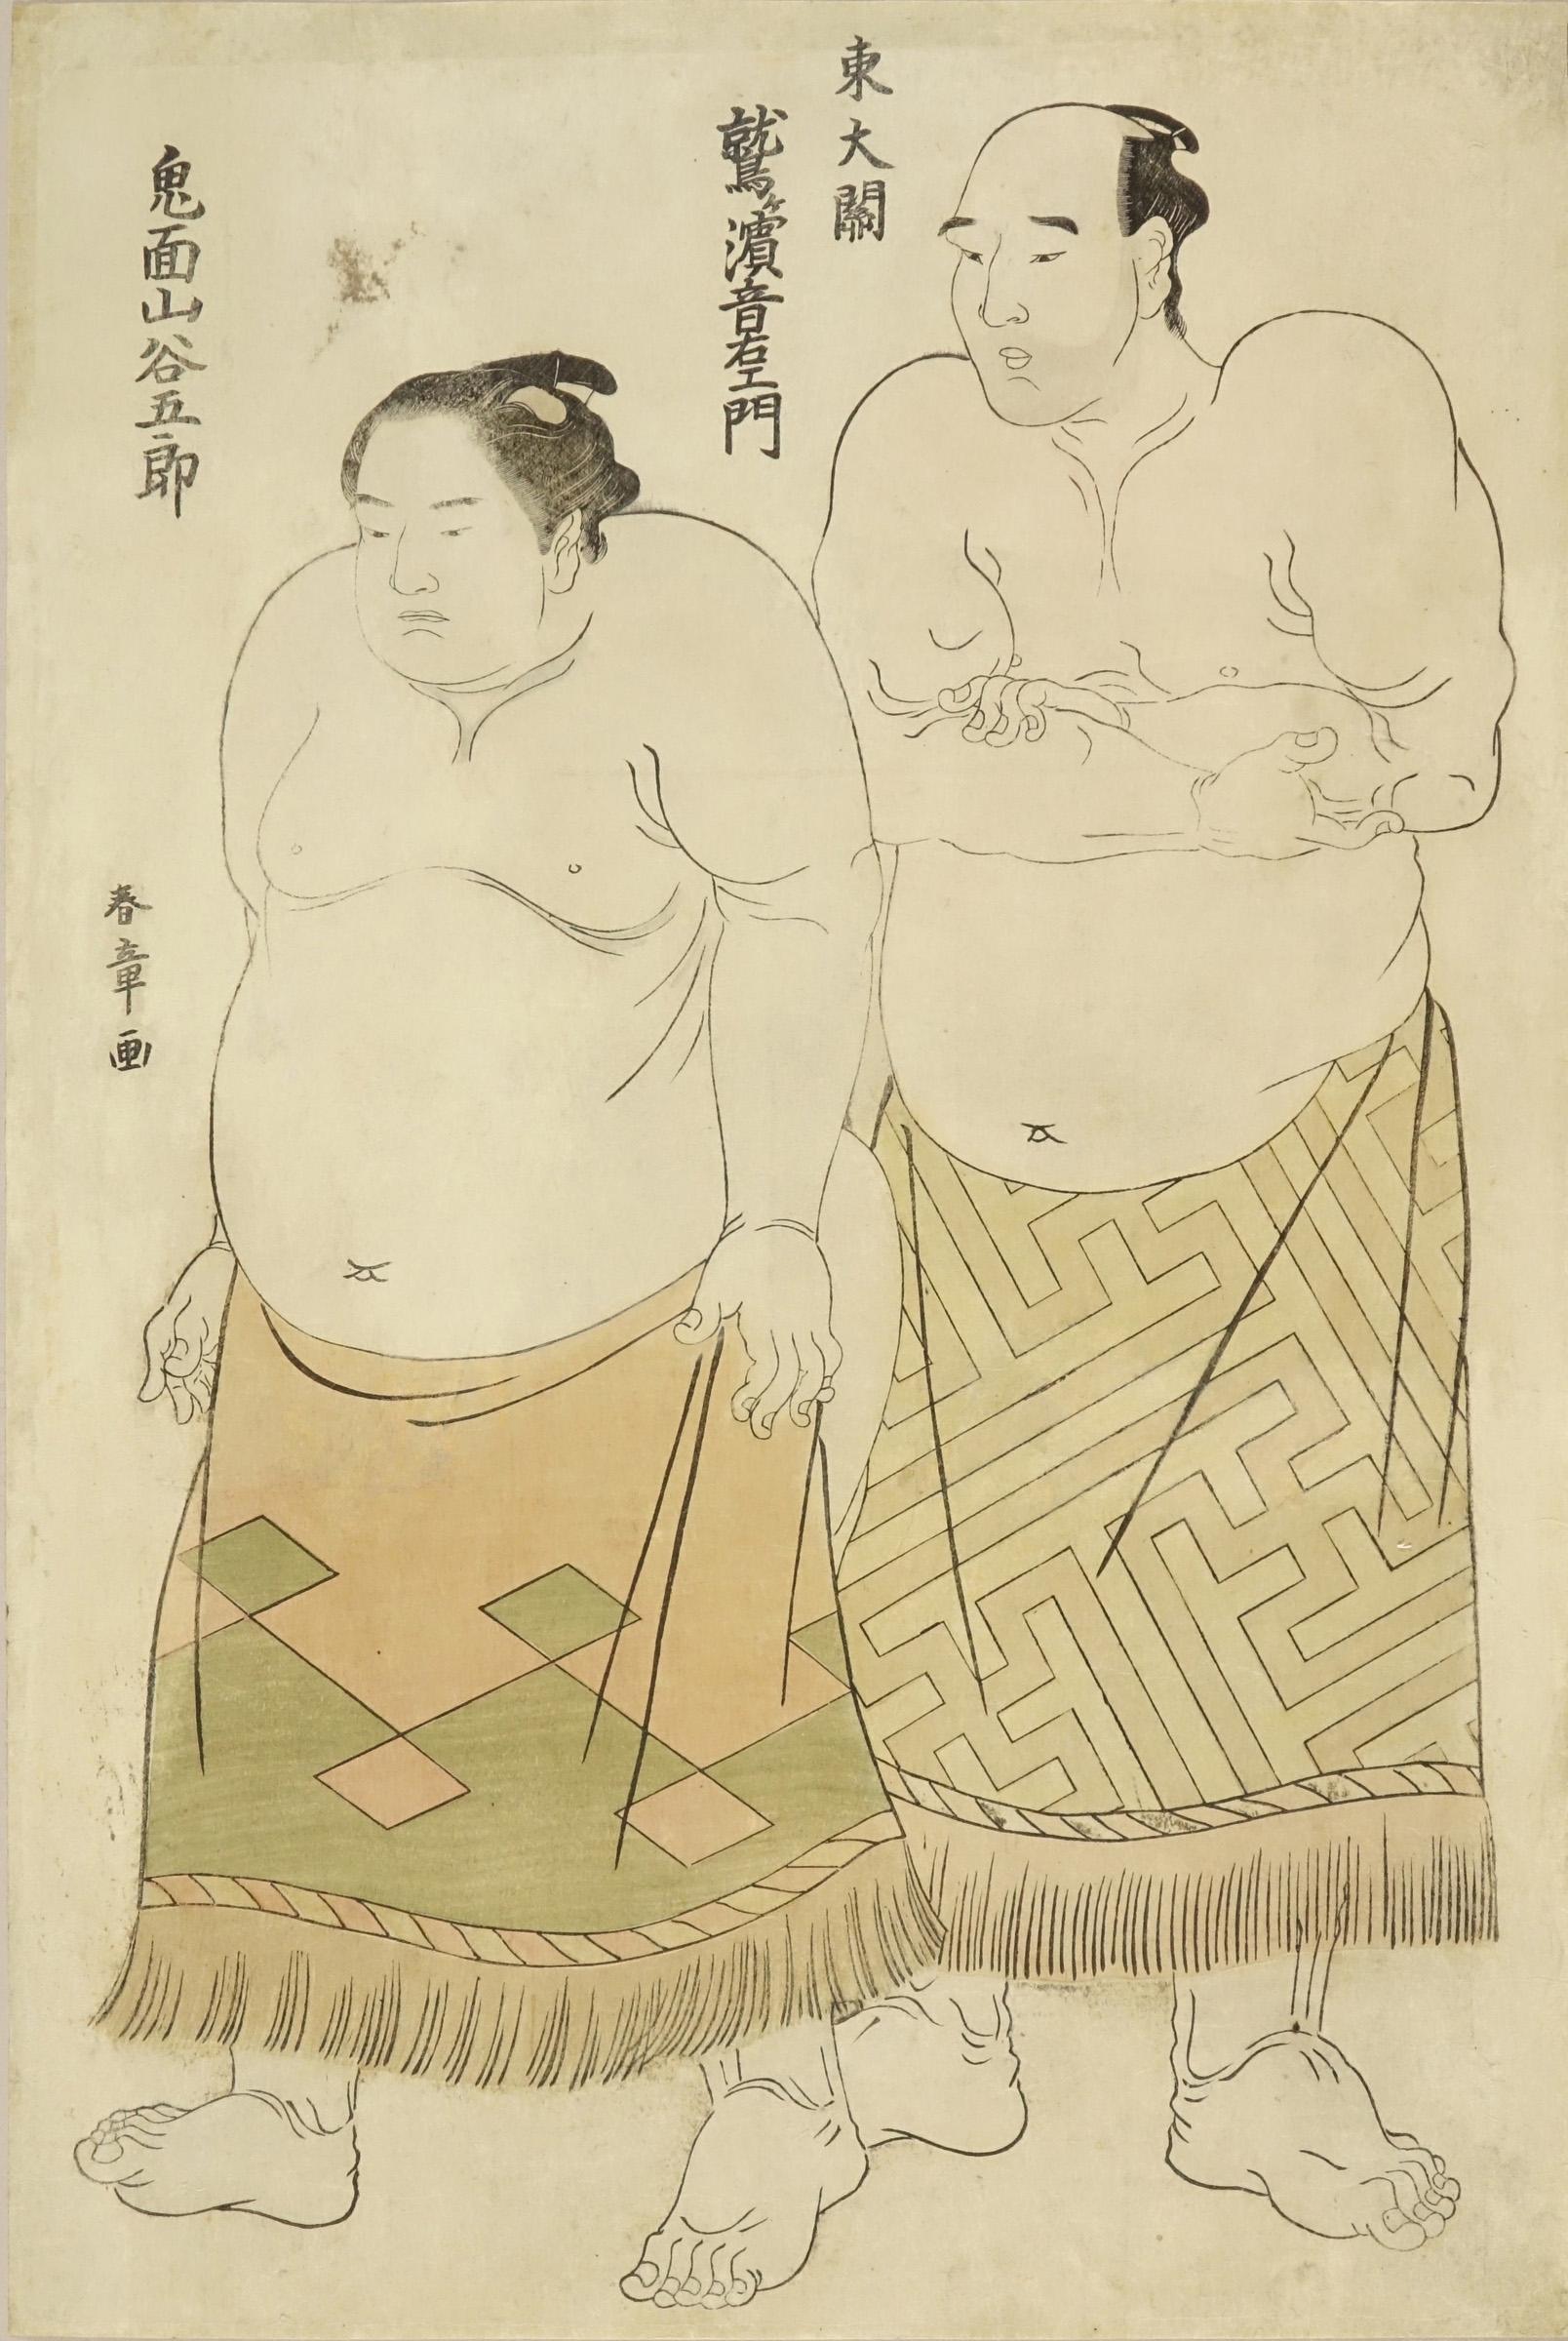 SHUNSHO Portrait of sumo wrestler Washigahama Otoemon (Niigata Pref.) and Kimenzan Hatsugoro (Kyoto)